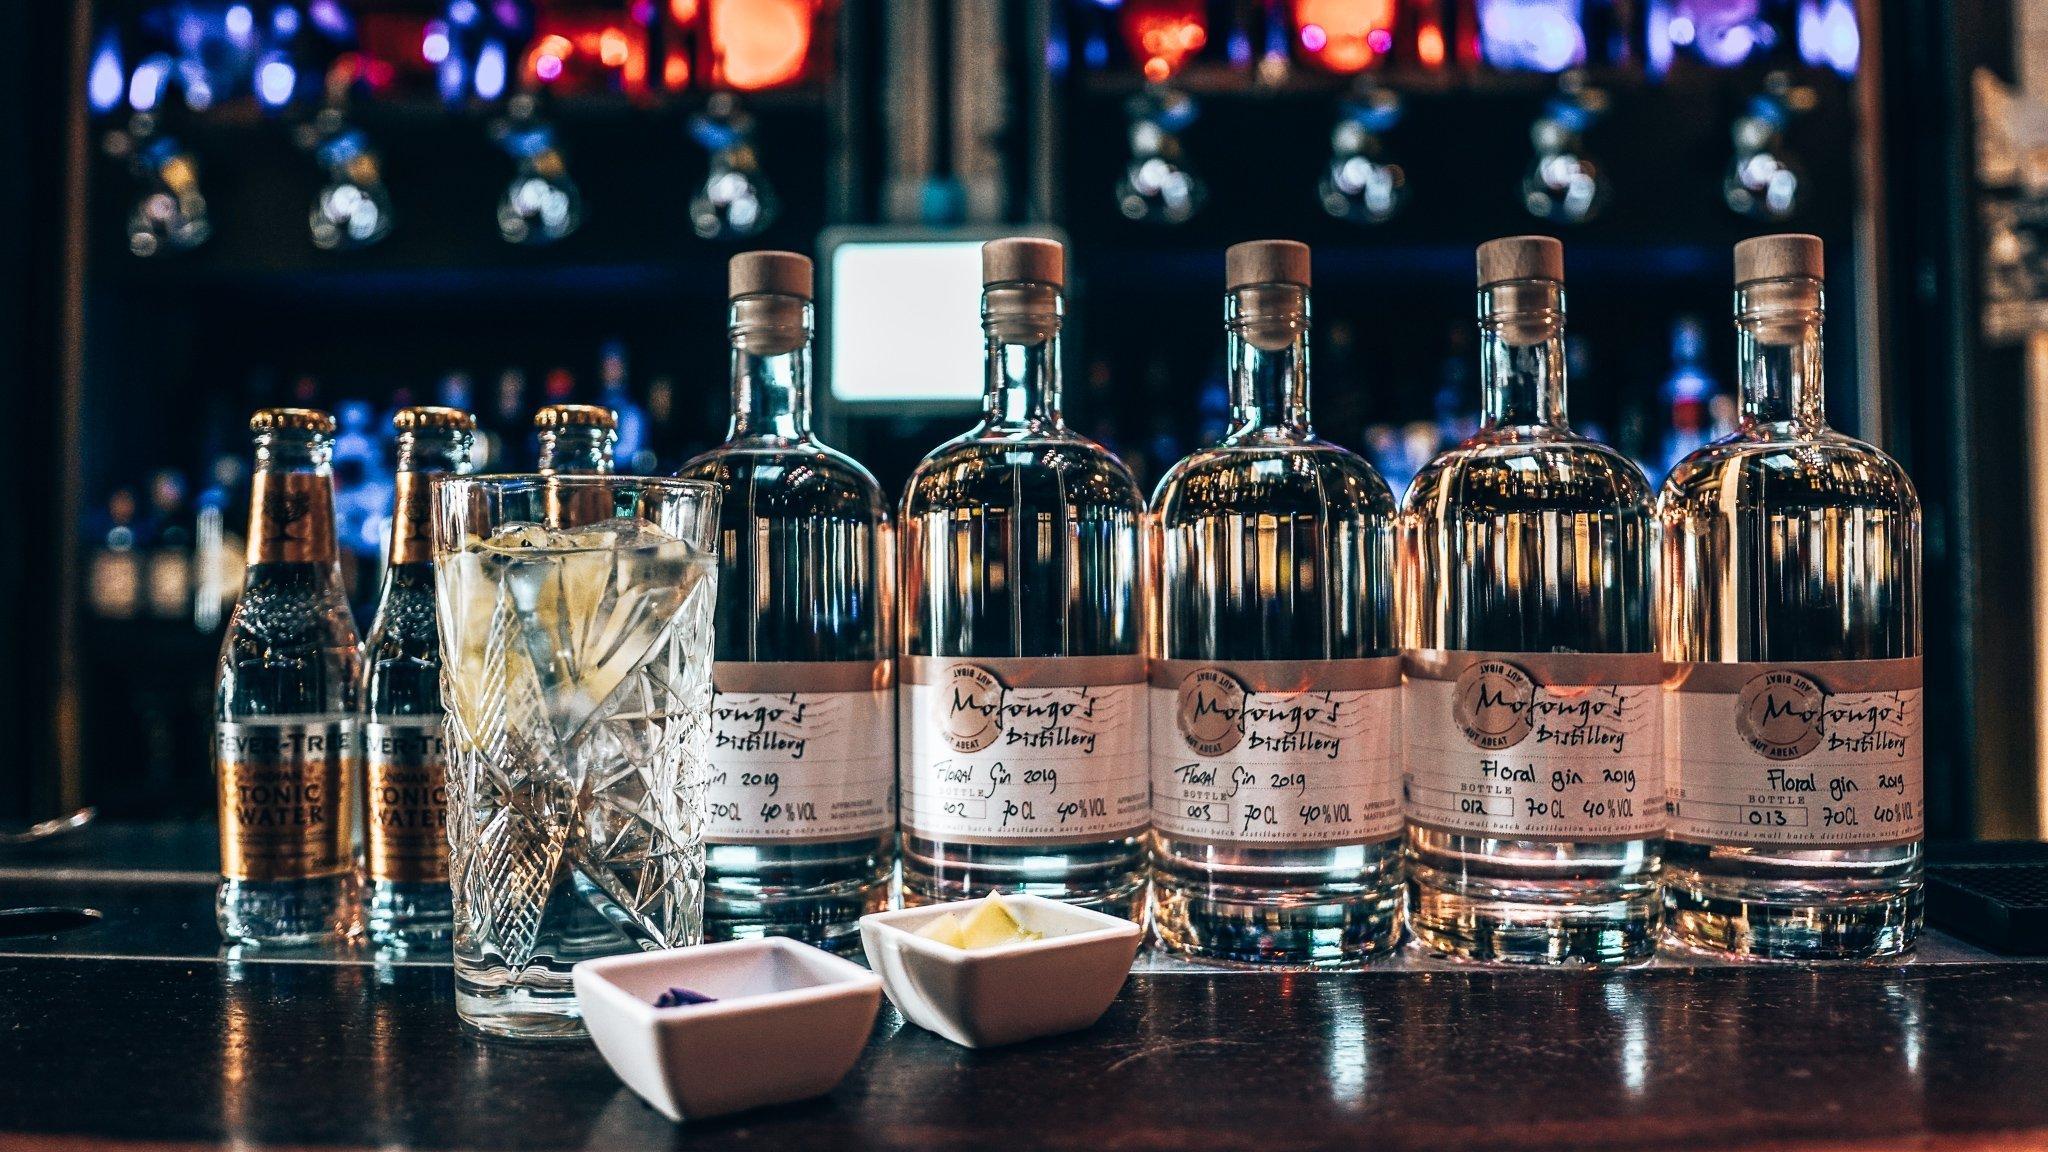 Mr. Mofongo Groningen, Floral Gin 2019, Alles over gin.